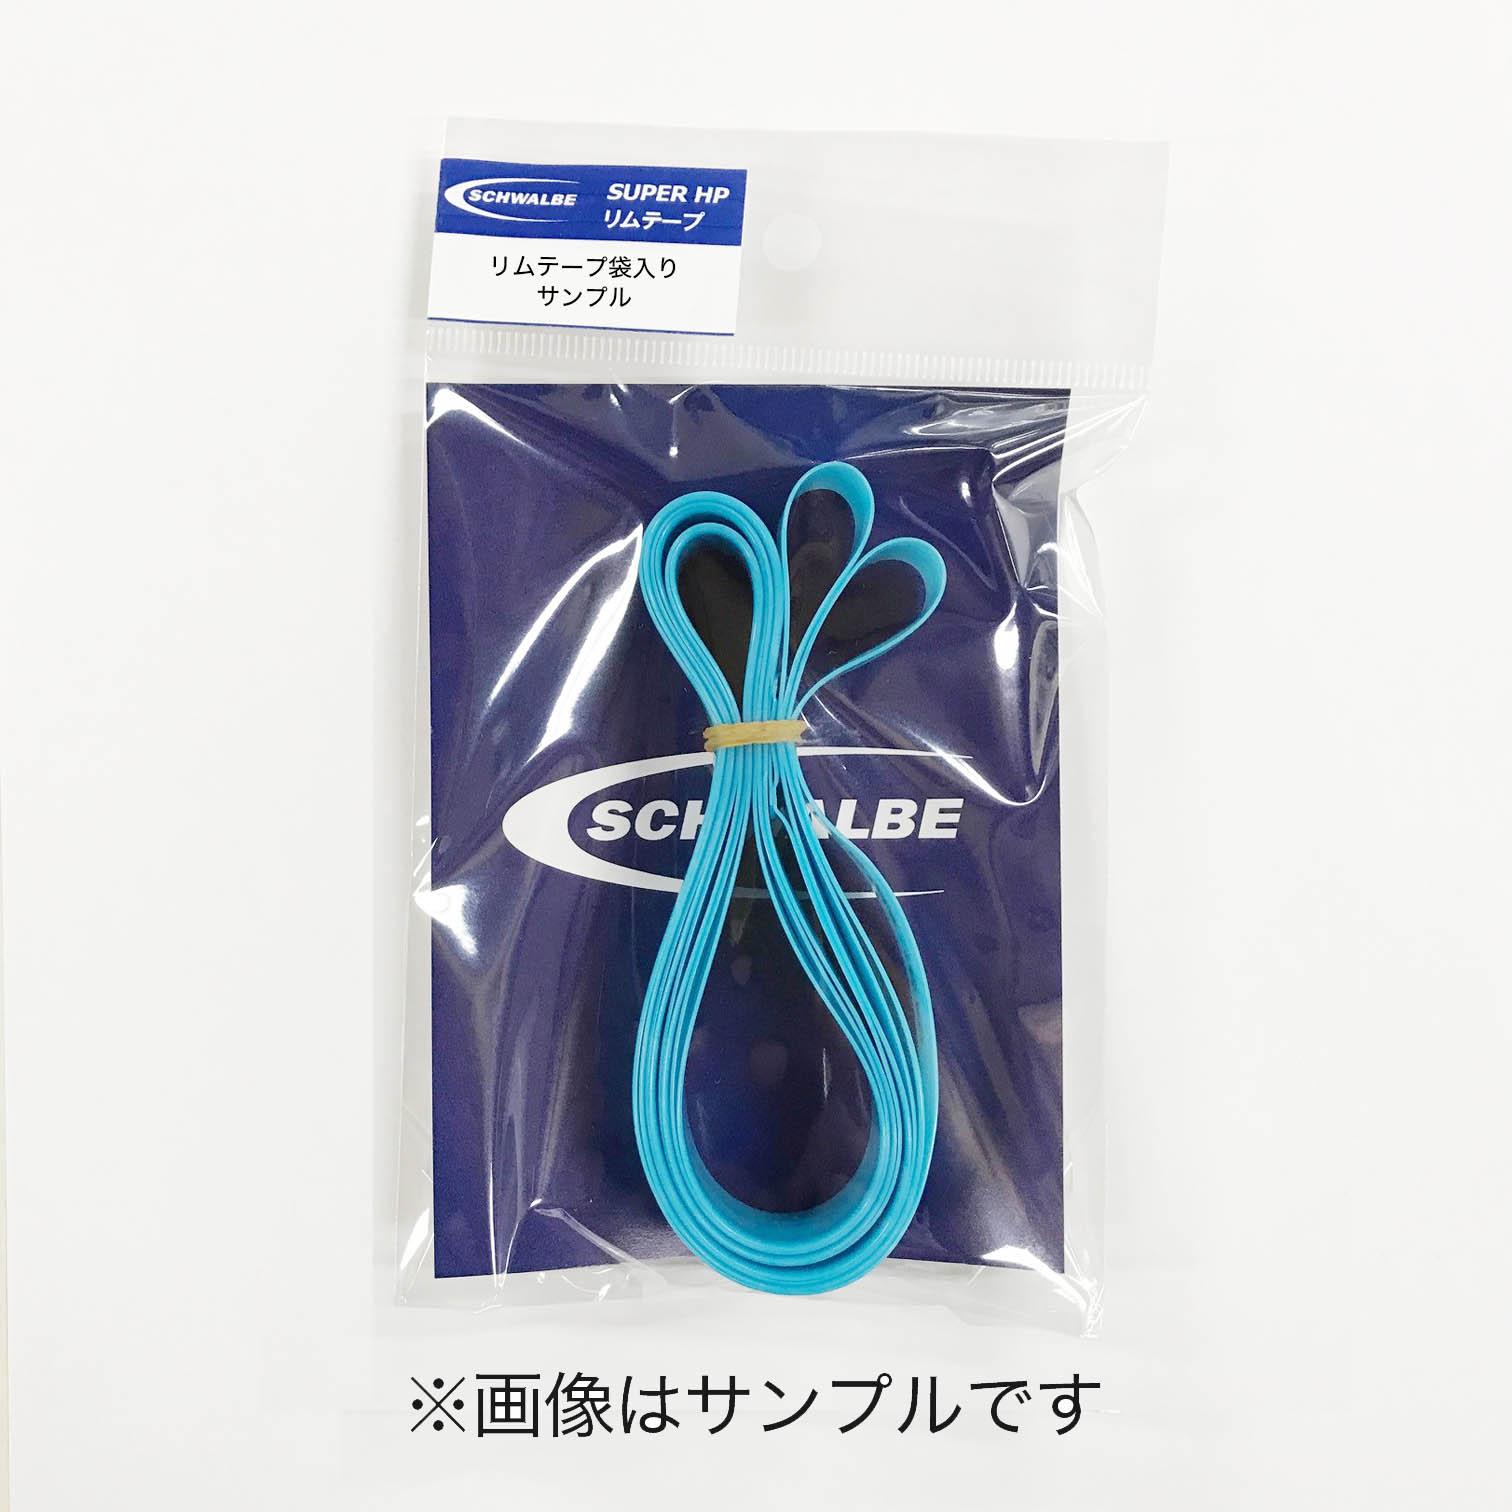 SCHWALBE(シュワルベ)HPリムテープ  25-26インチ用